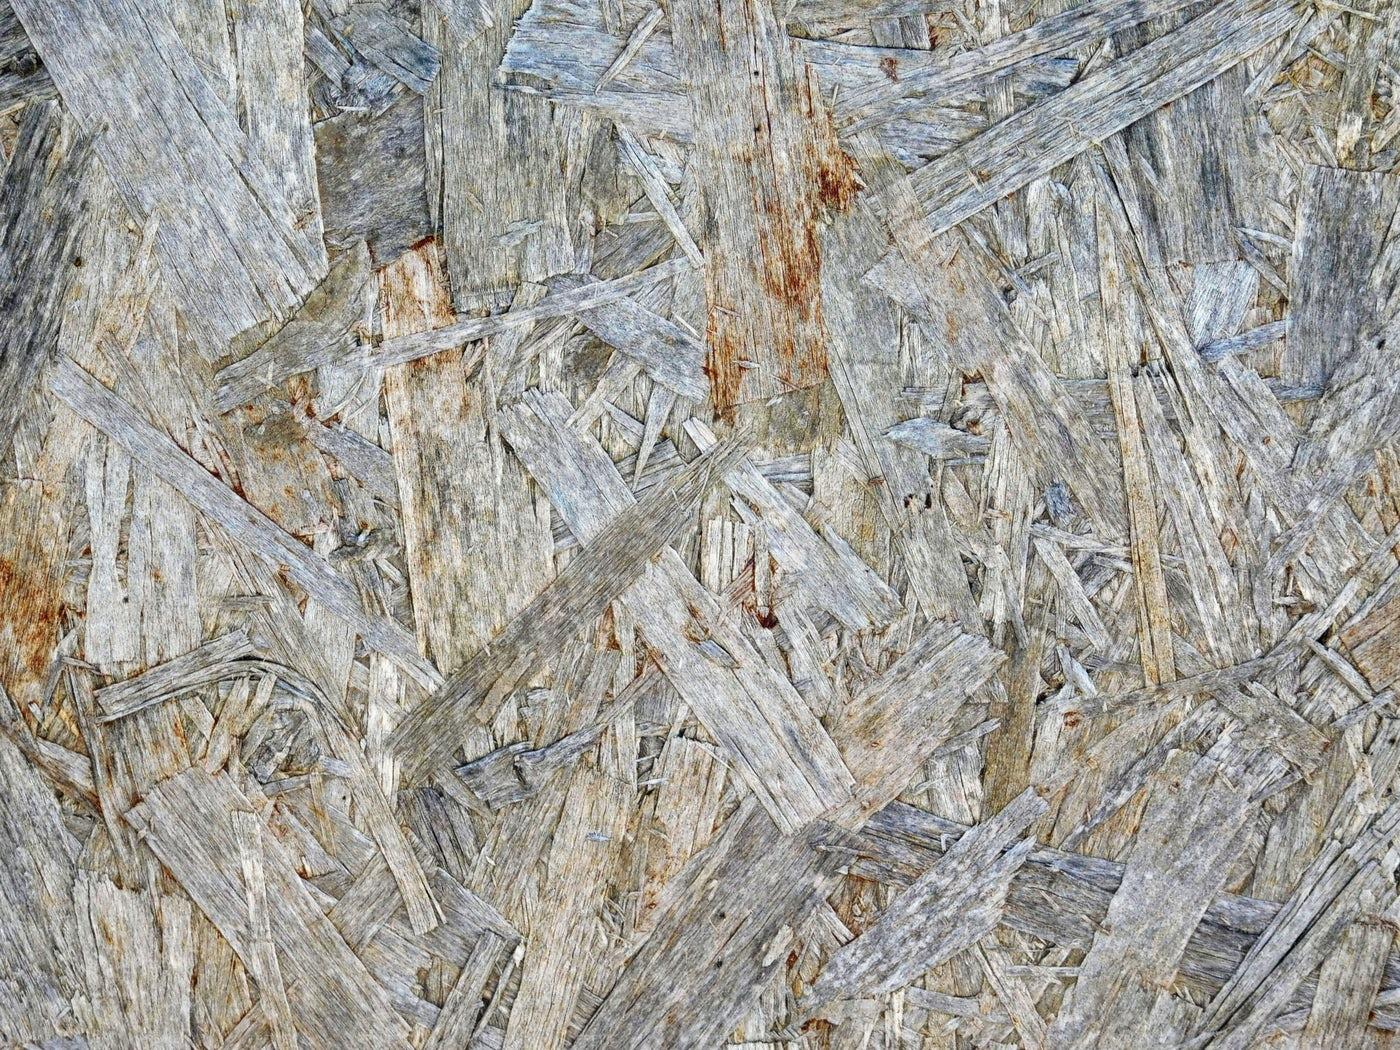 Rotten Wood Texture: Stock Photos